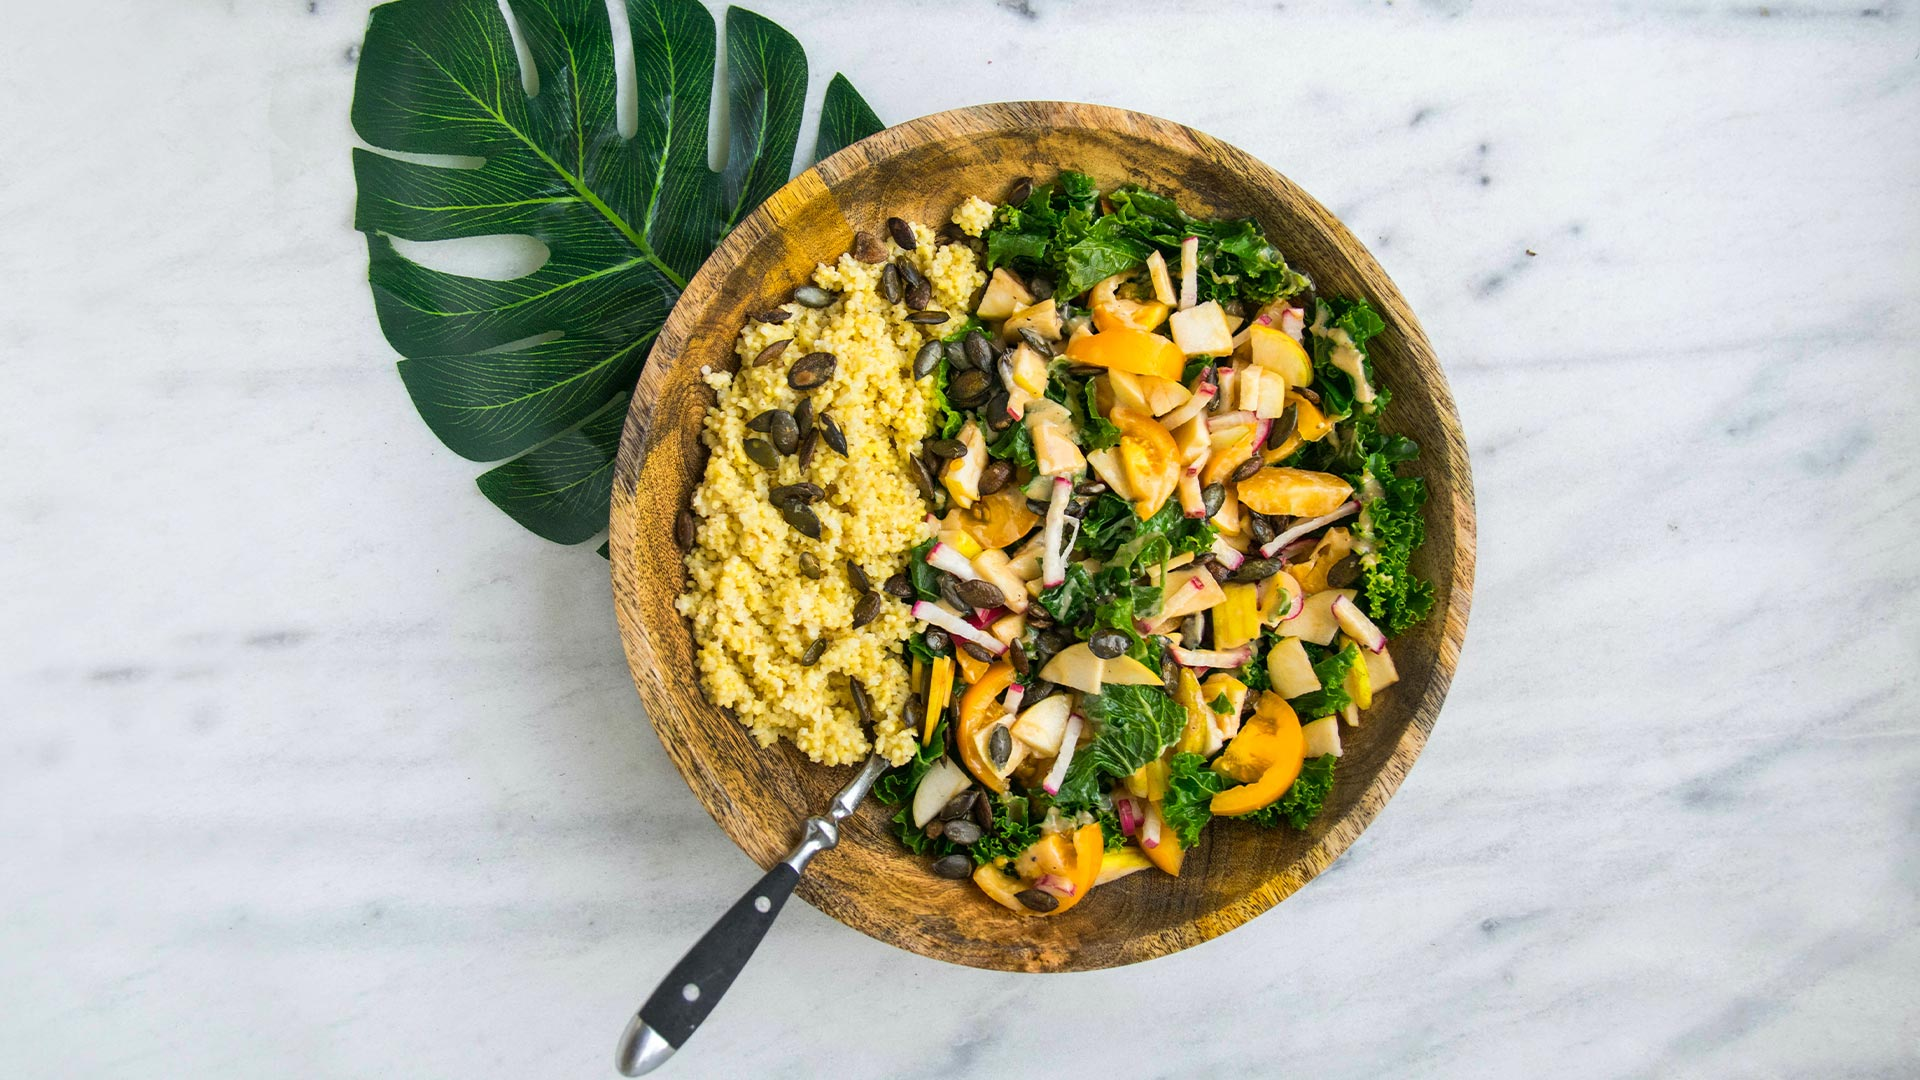 Vegan cous cous recipe